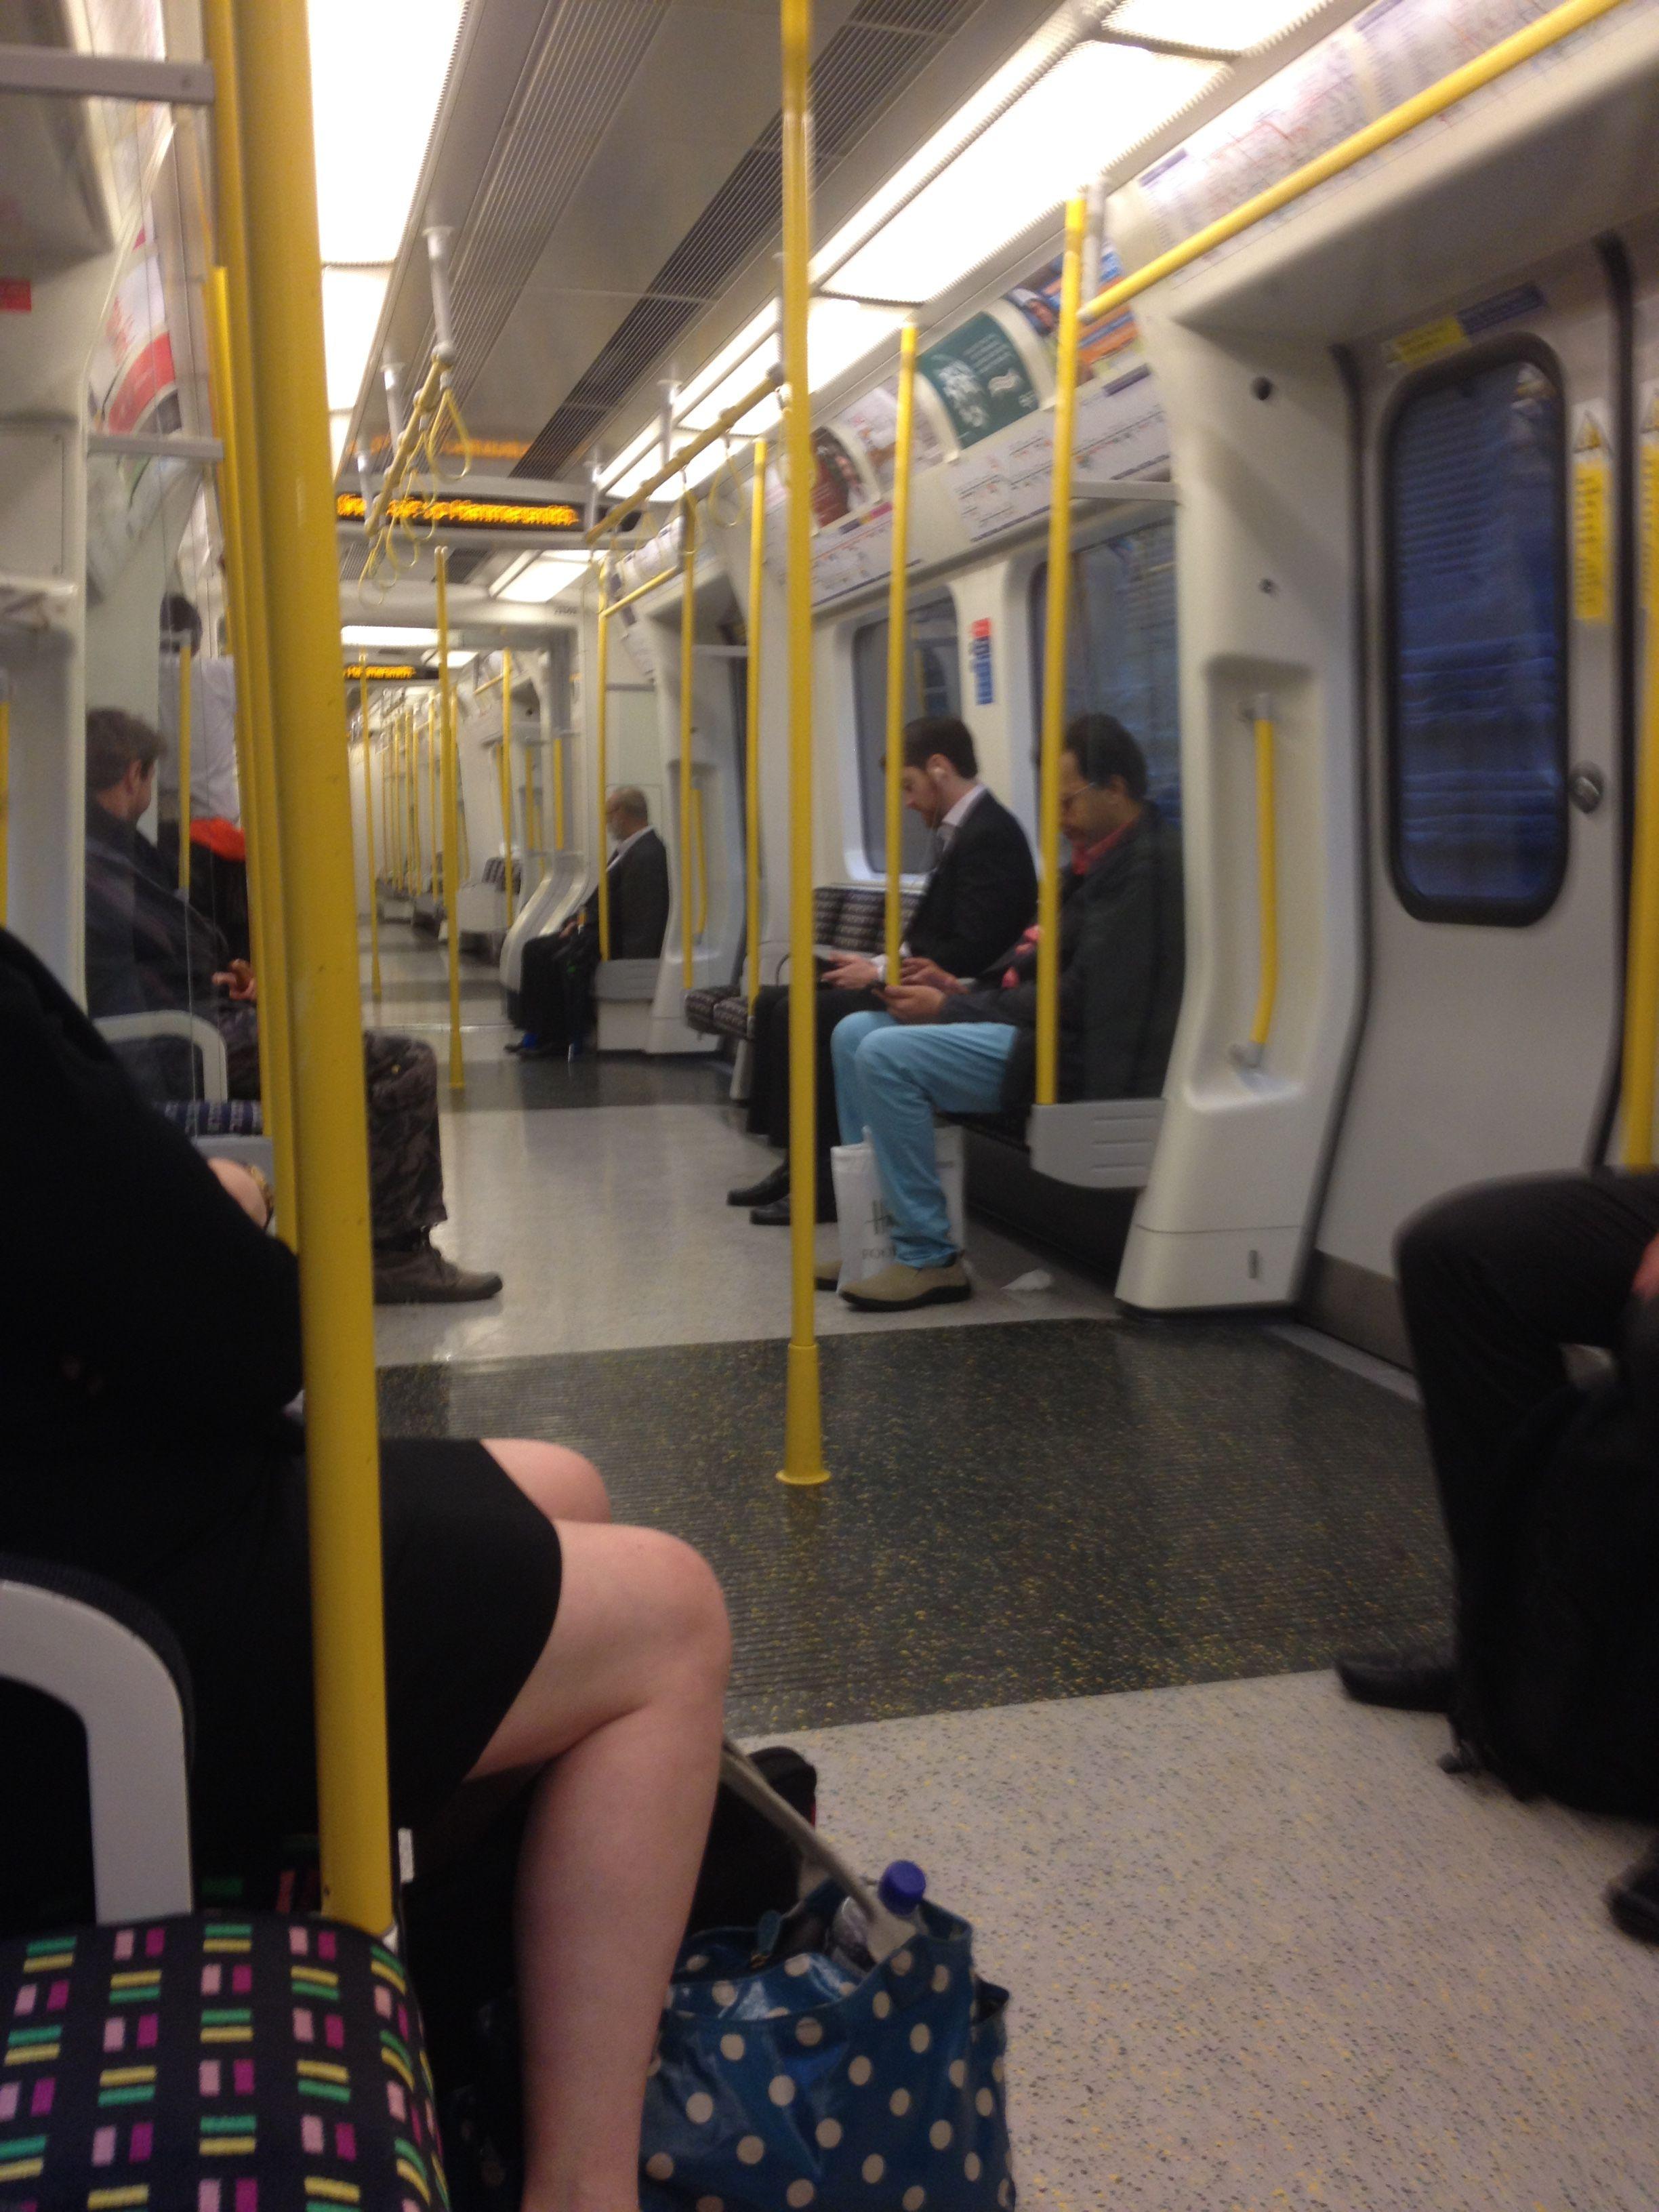 london tube train Liverpool street london underground